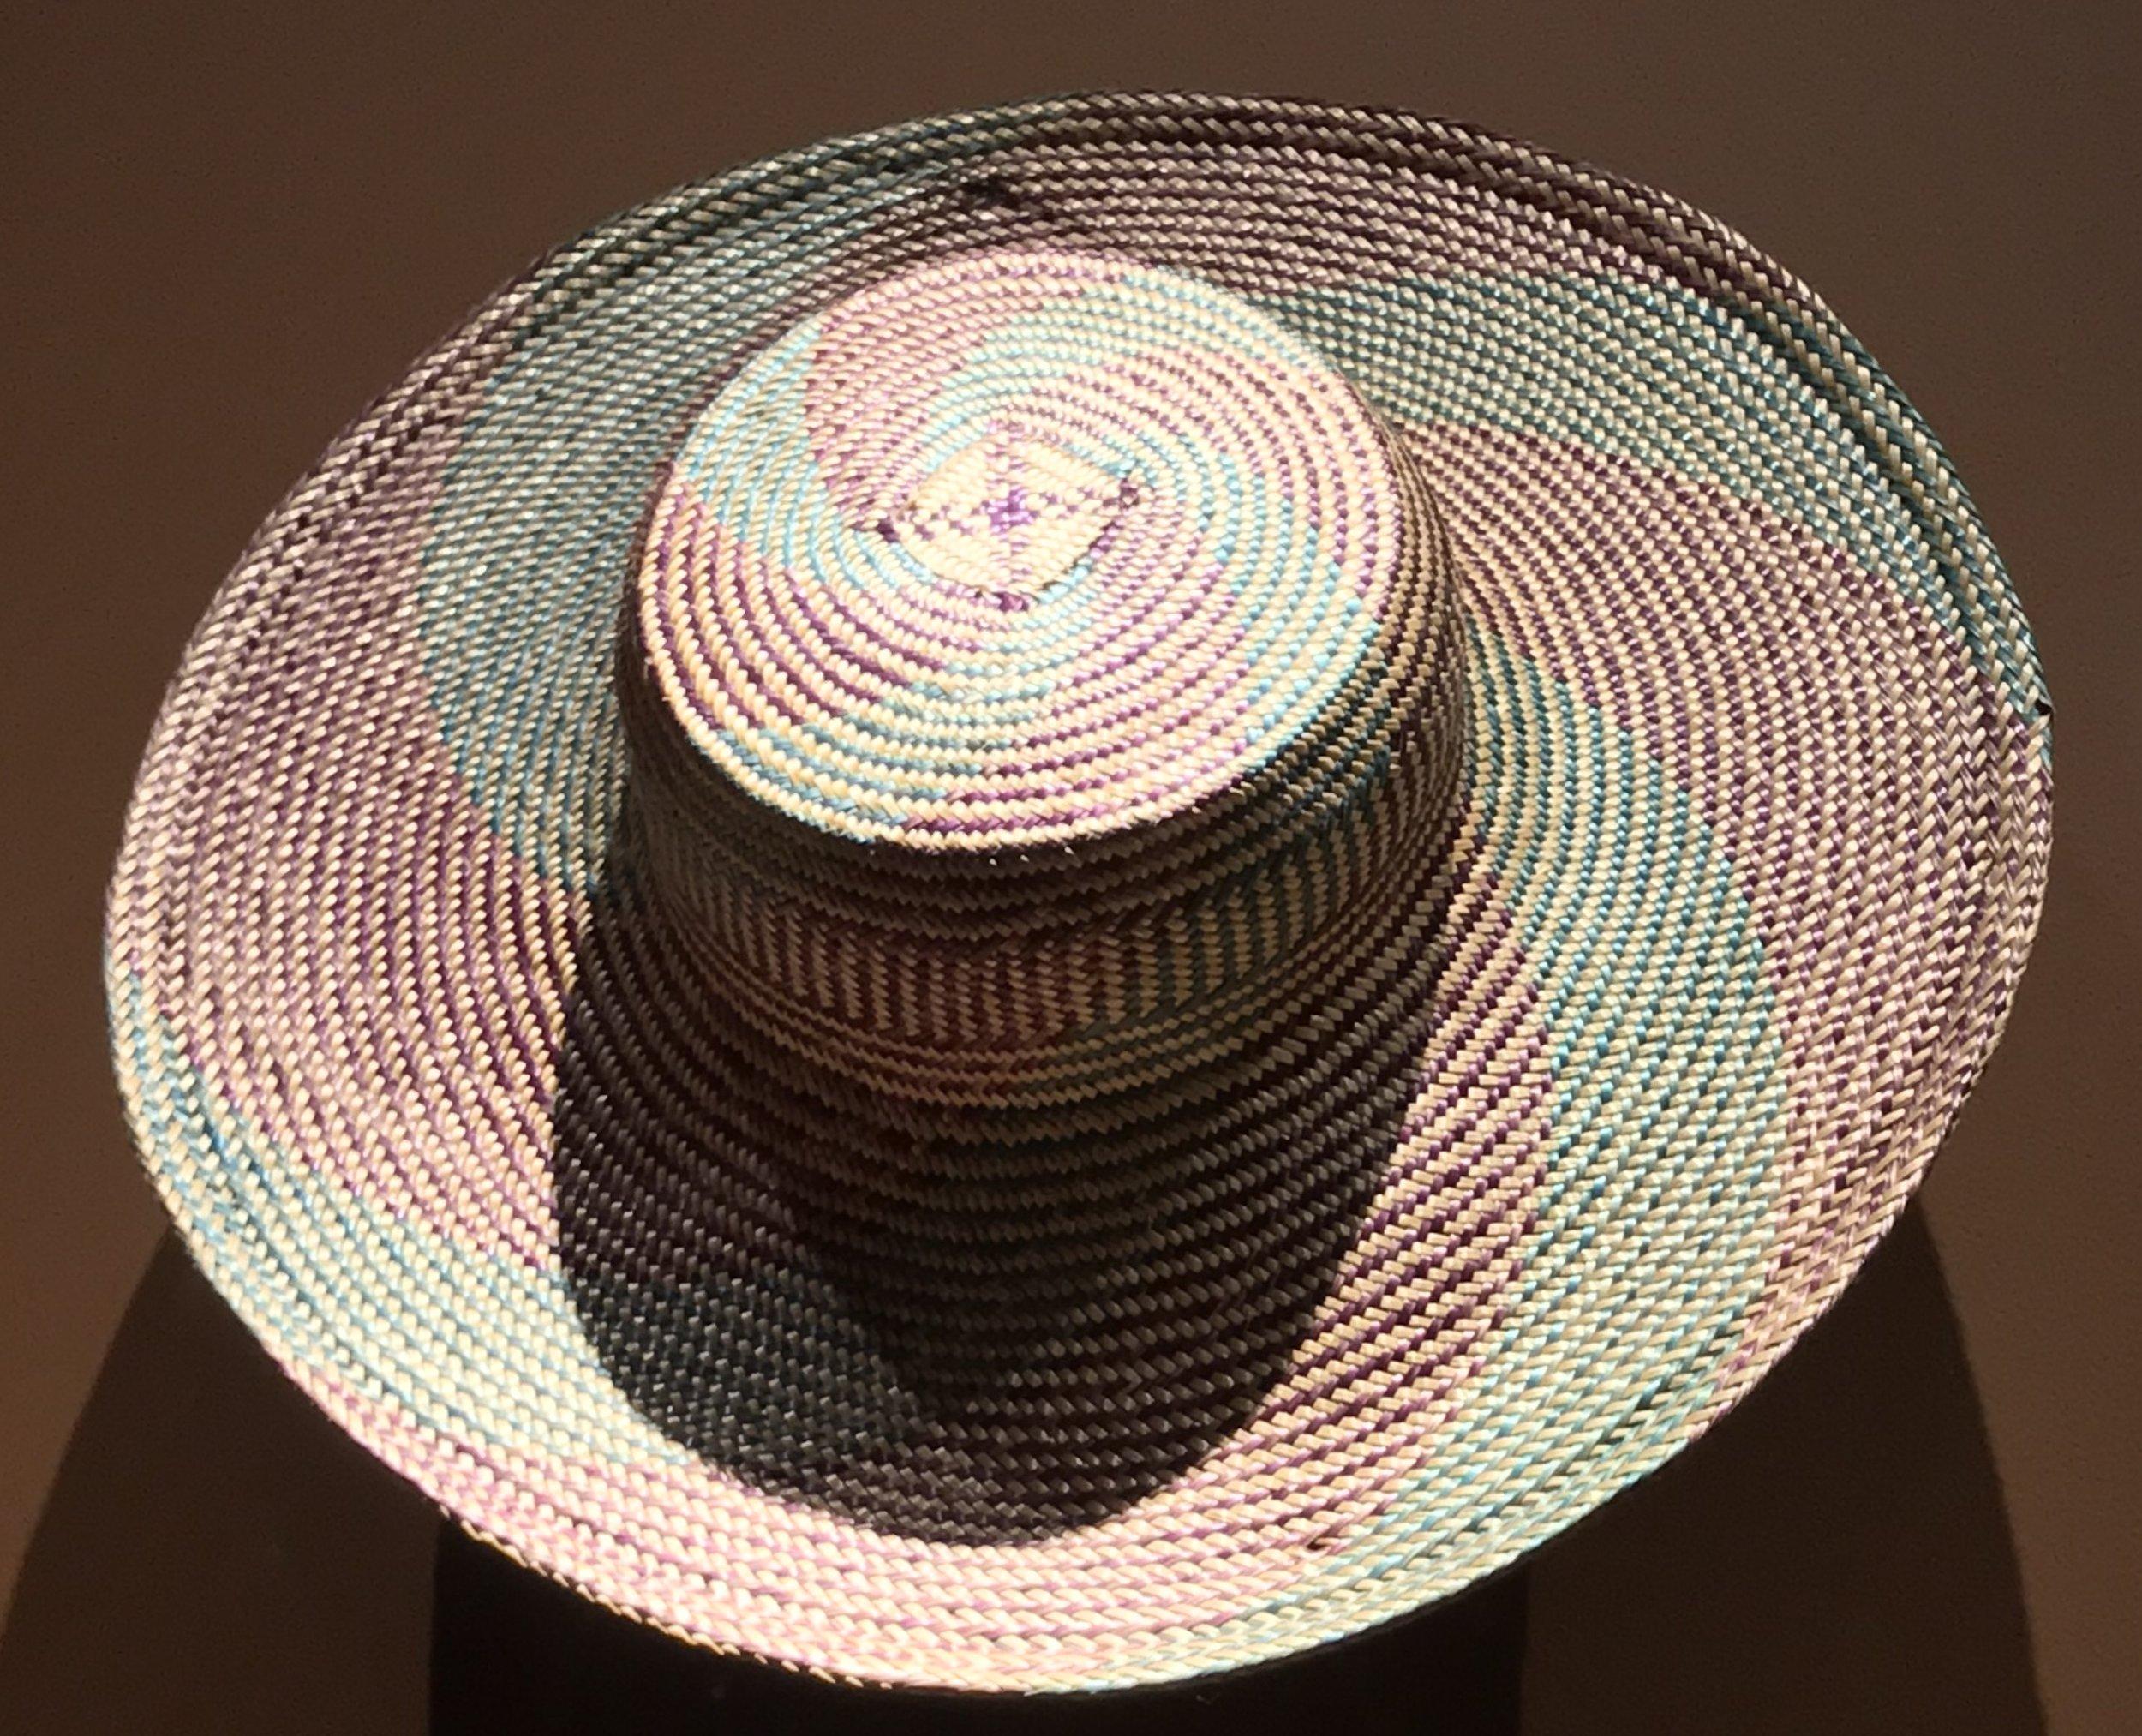 Madagascan hats